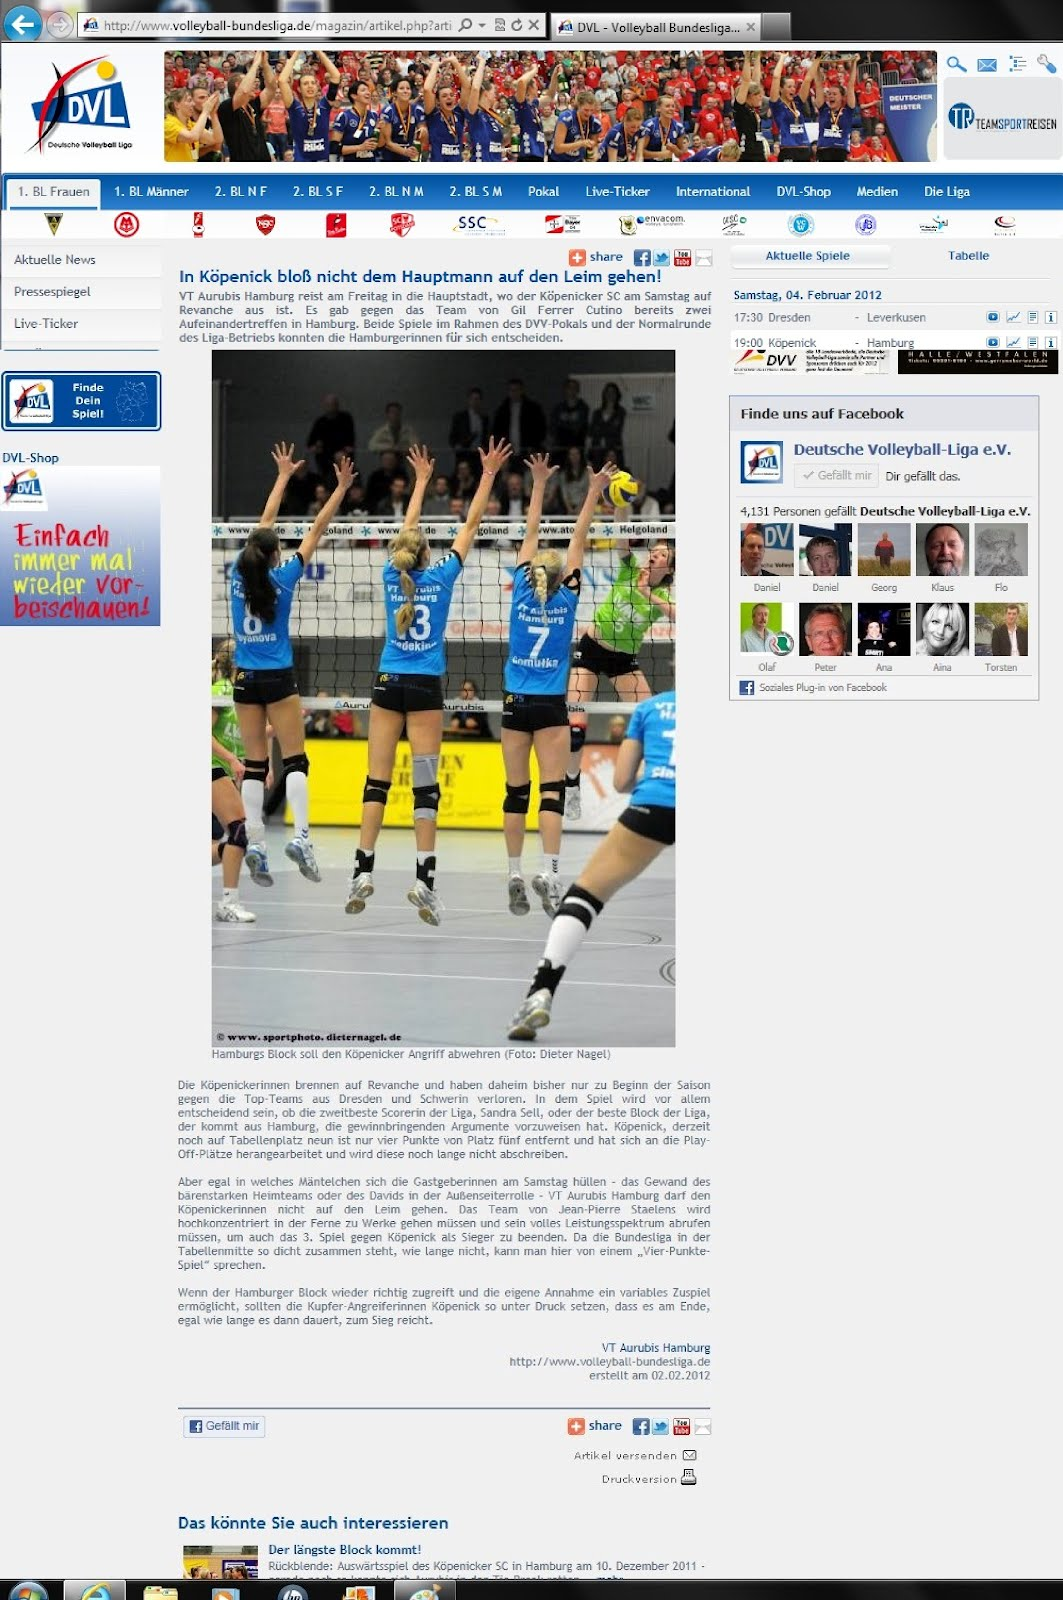 Volleyball live-ticker